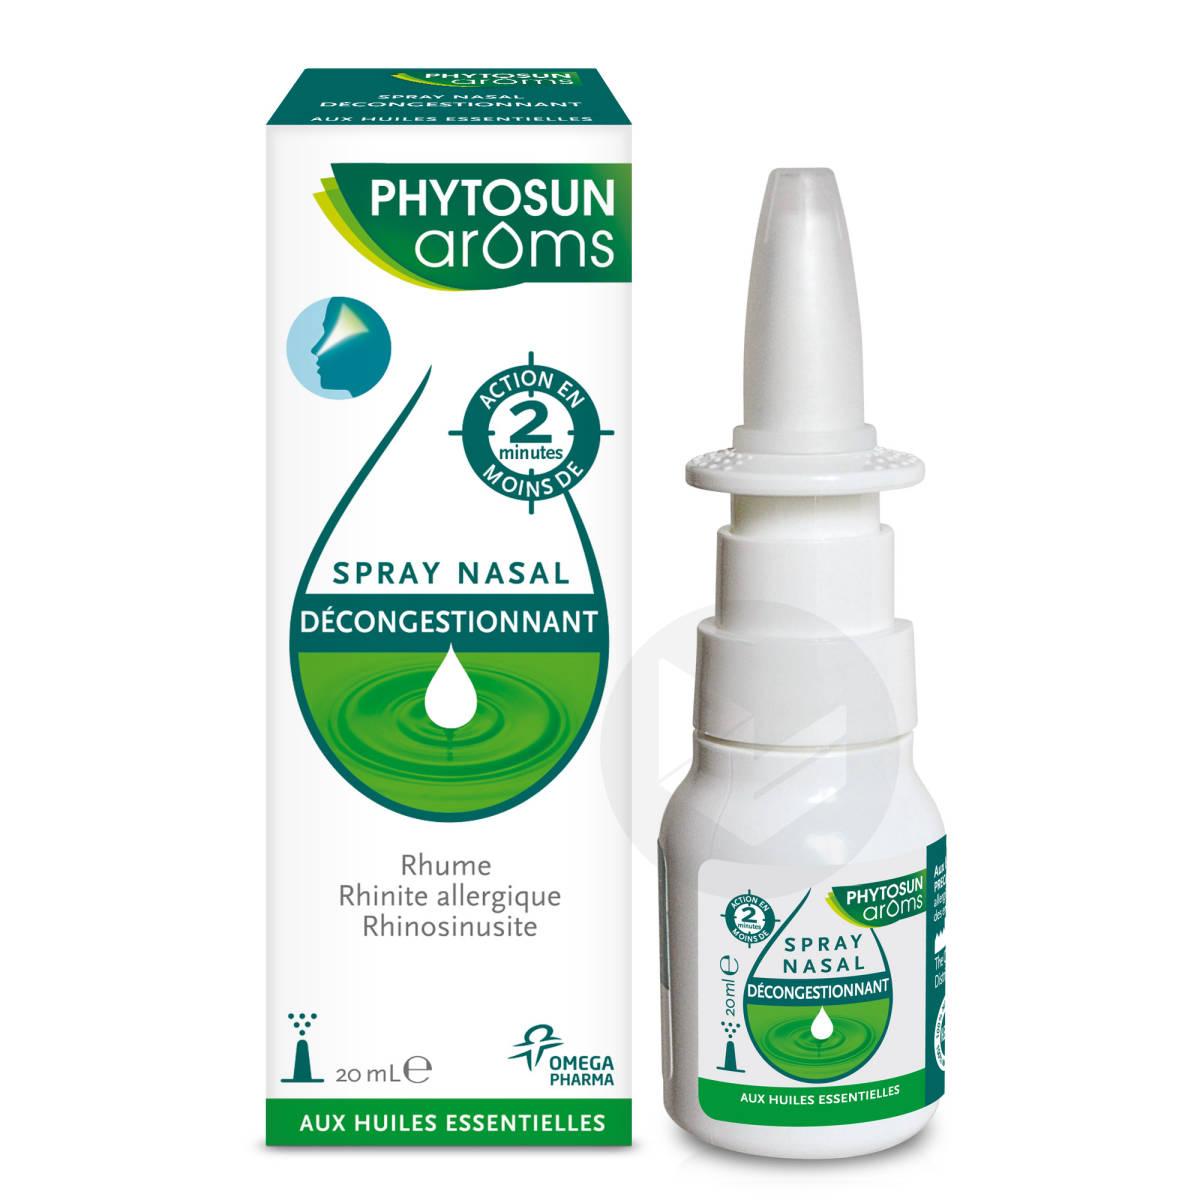 Spray Nasal Decongespray Nasal Decongestionnant Aux Huiles Essentielles 20 Ml